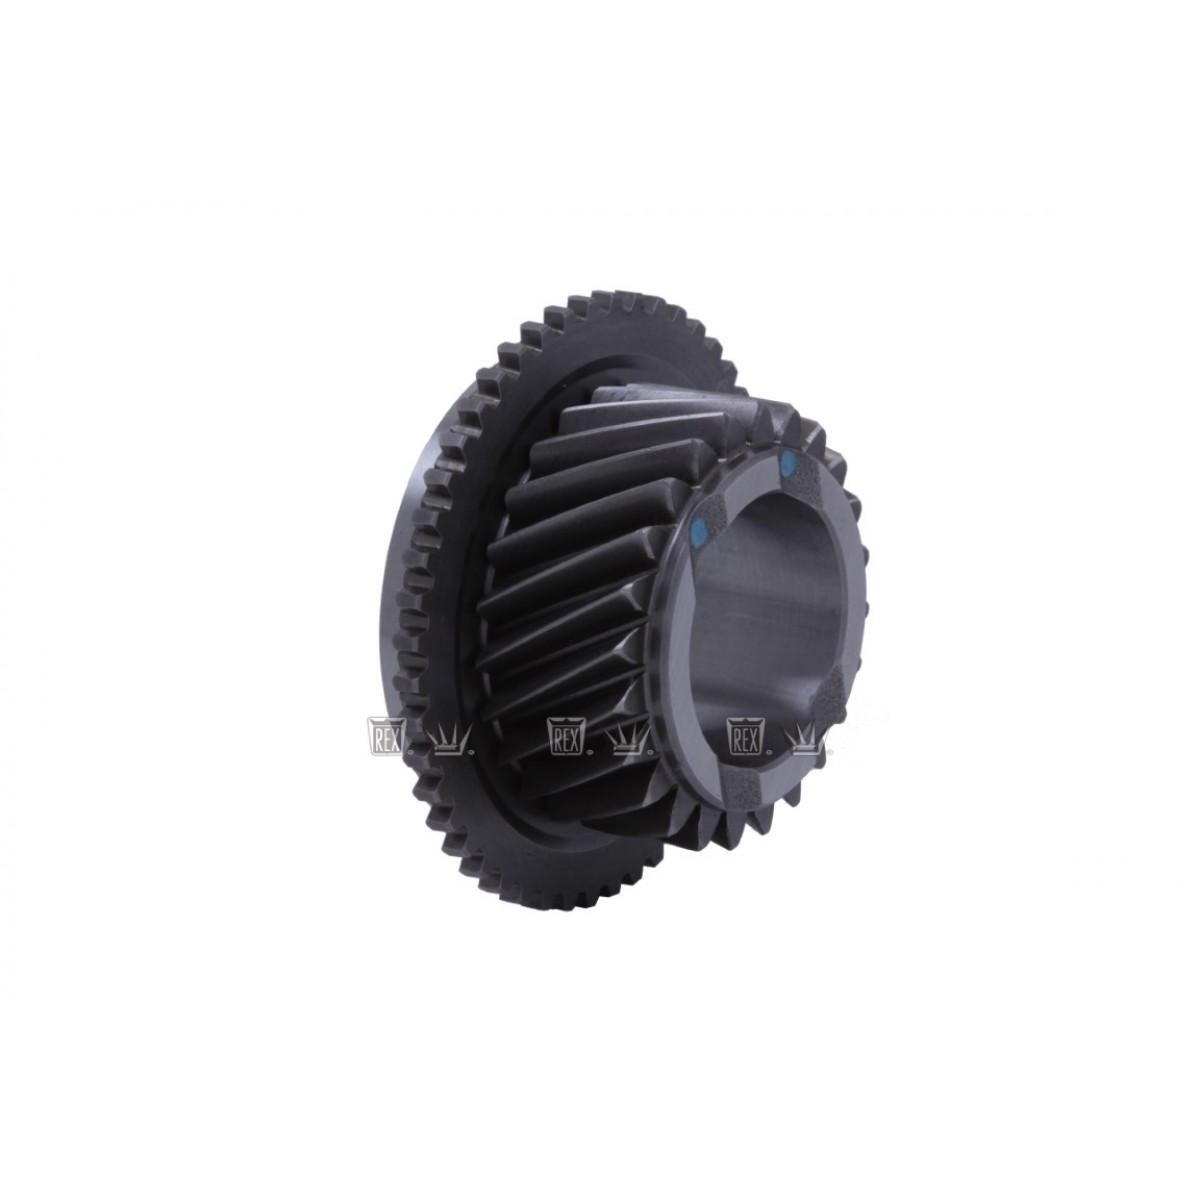 Engrenagem da 5 marcha caixa cambio Eaton FSO4305/FSO4405